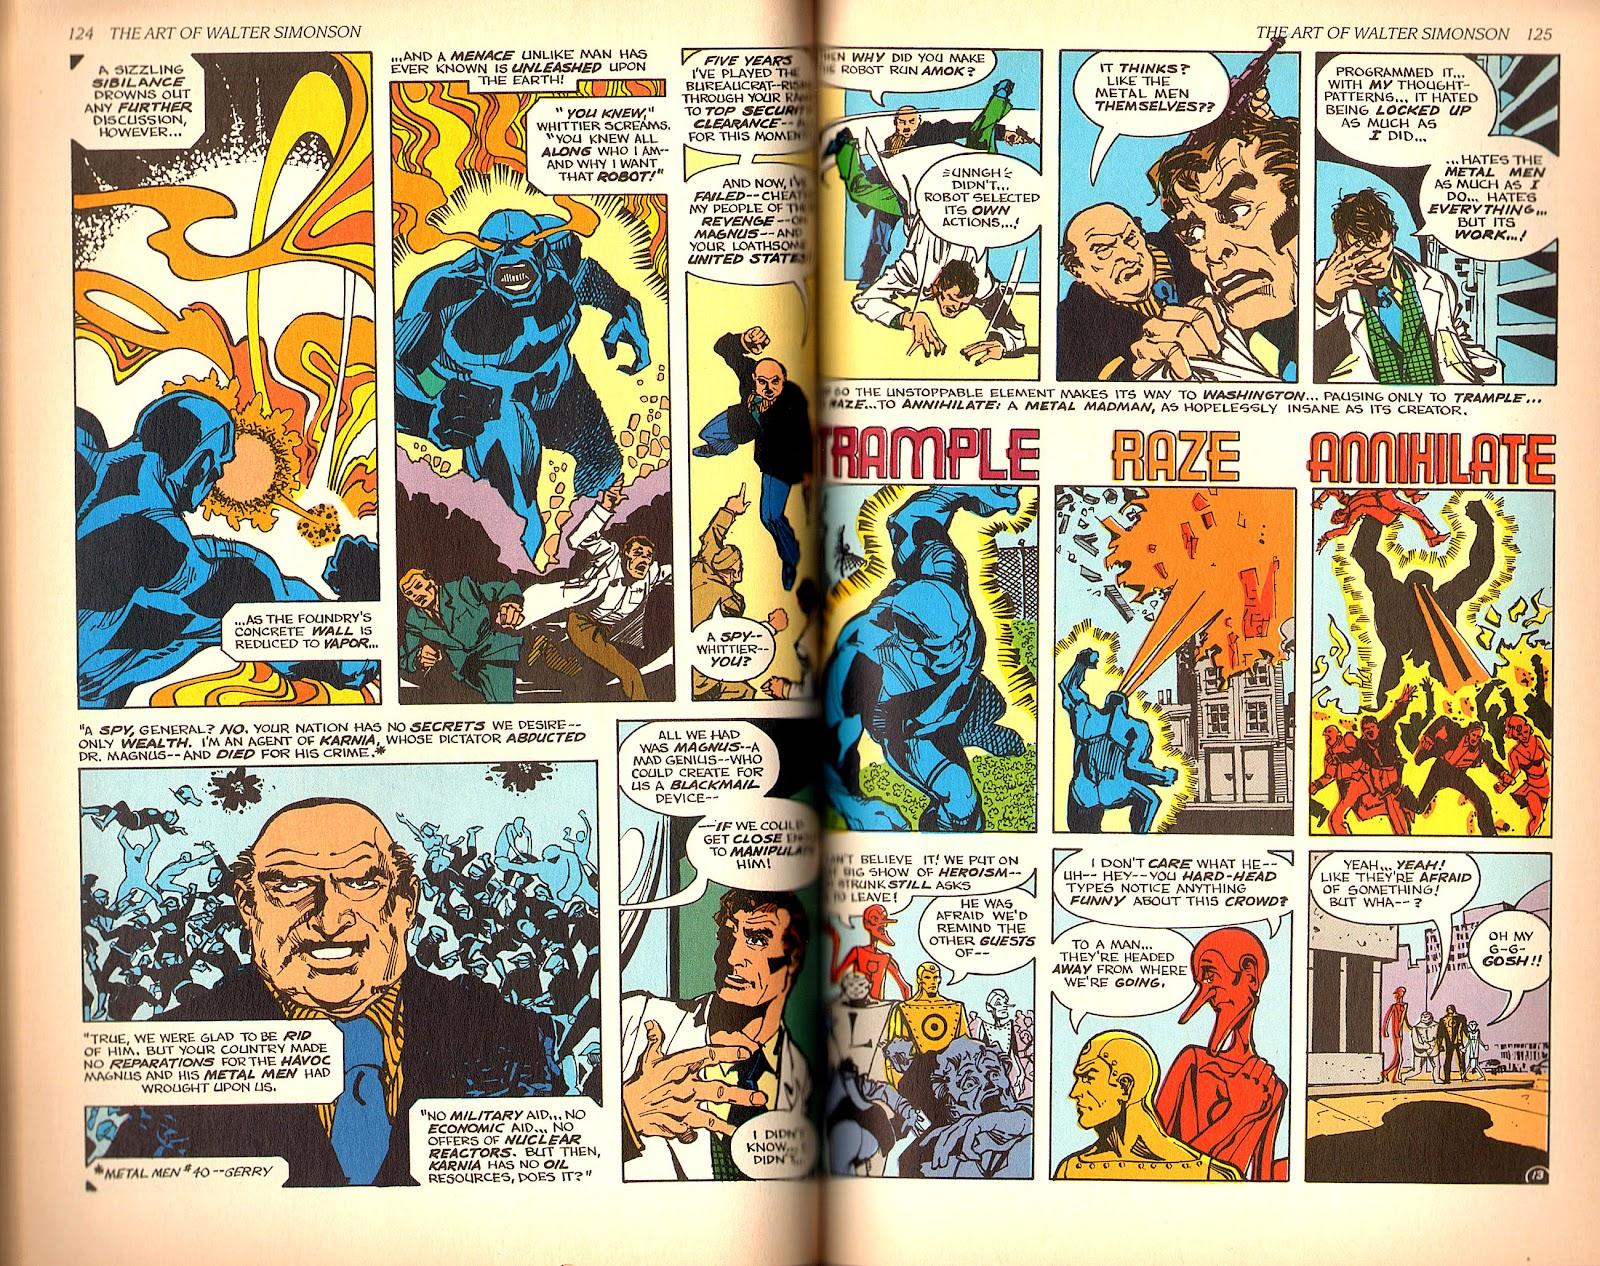 Read online The Art of Walter Simonson comic -  Issue # TPB - 64